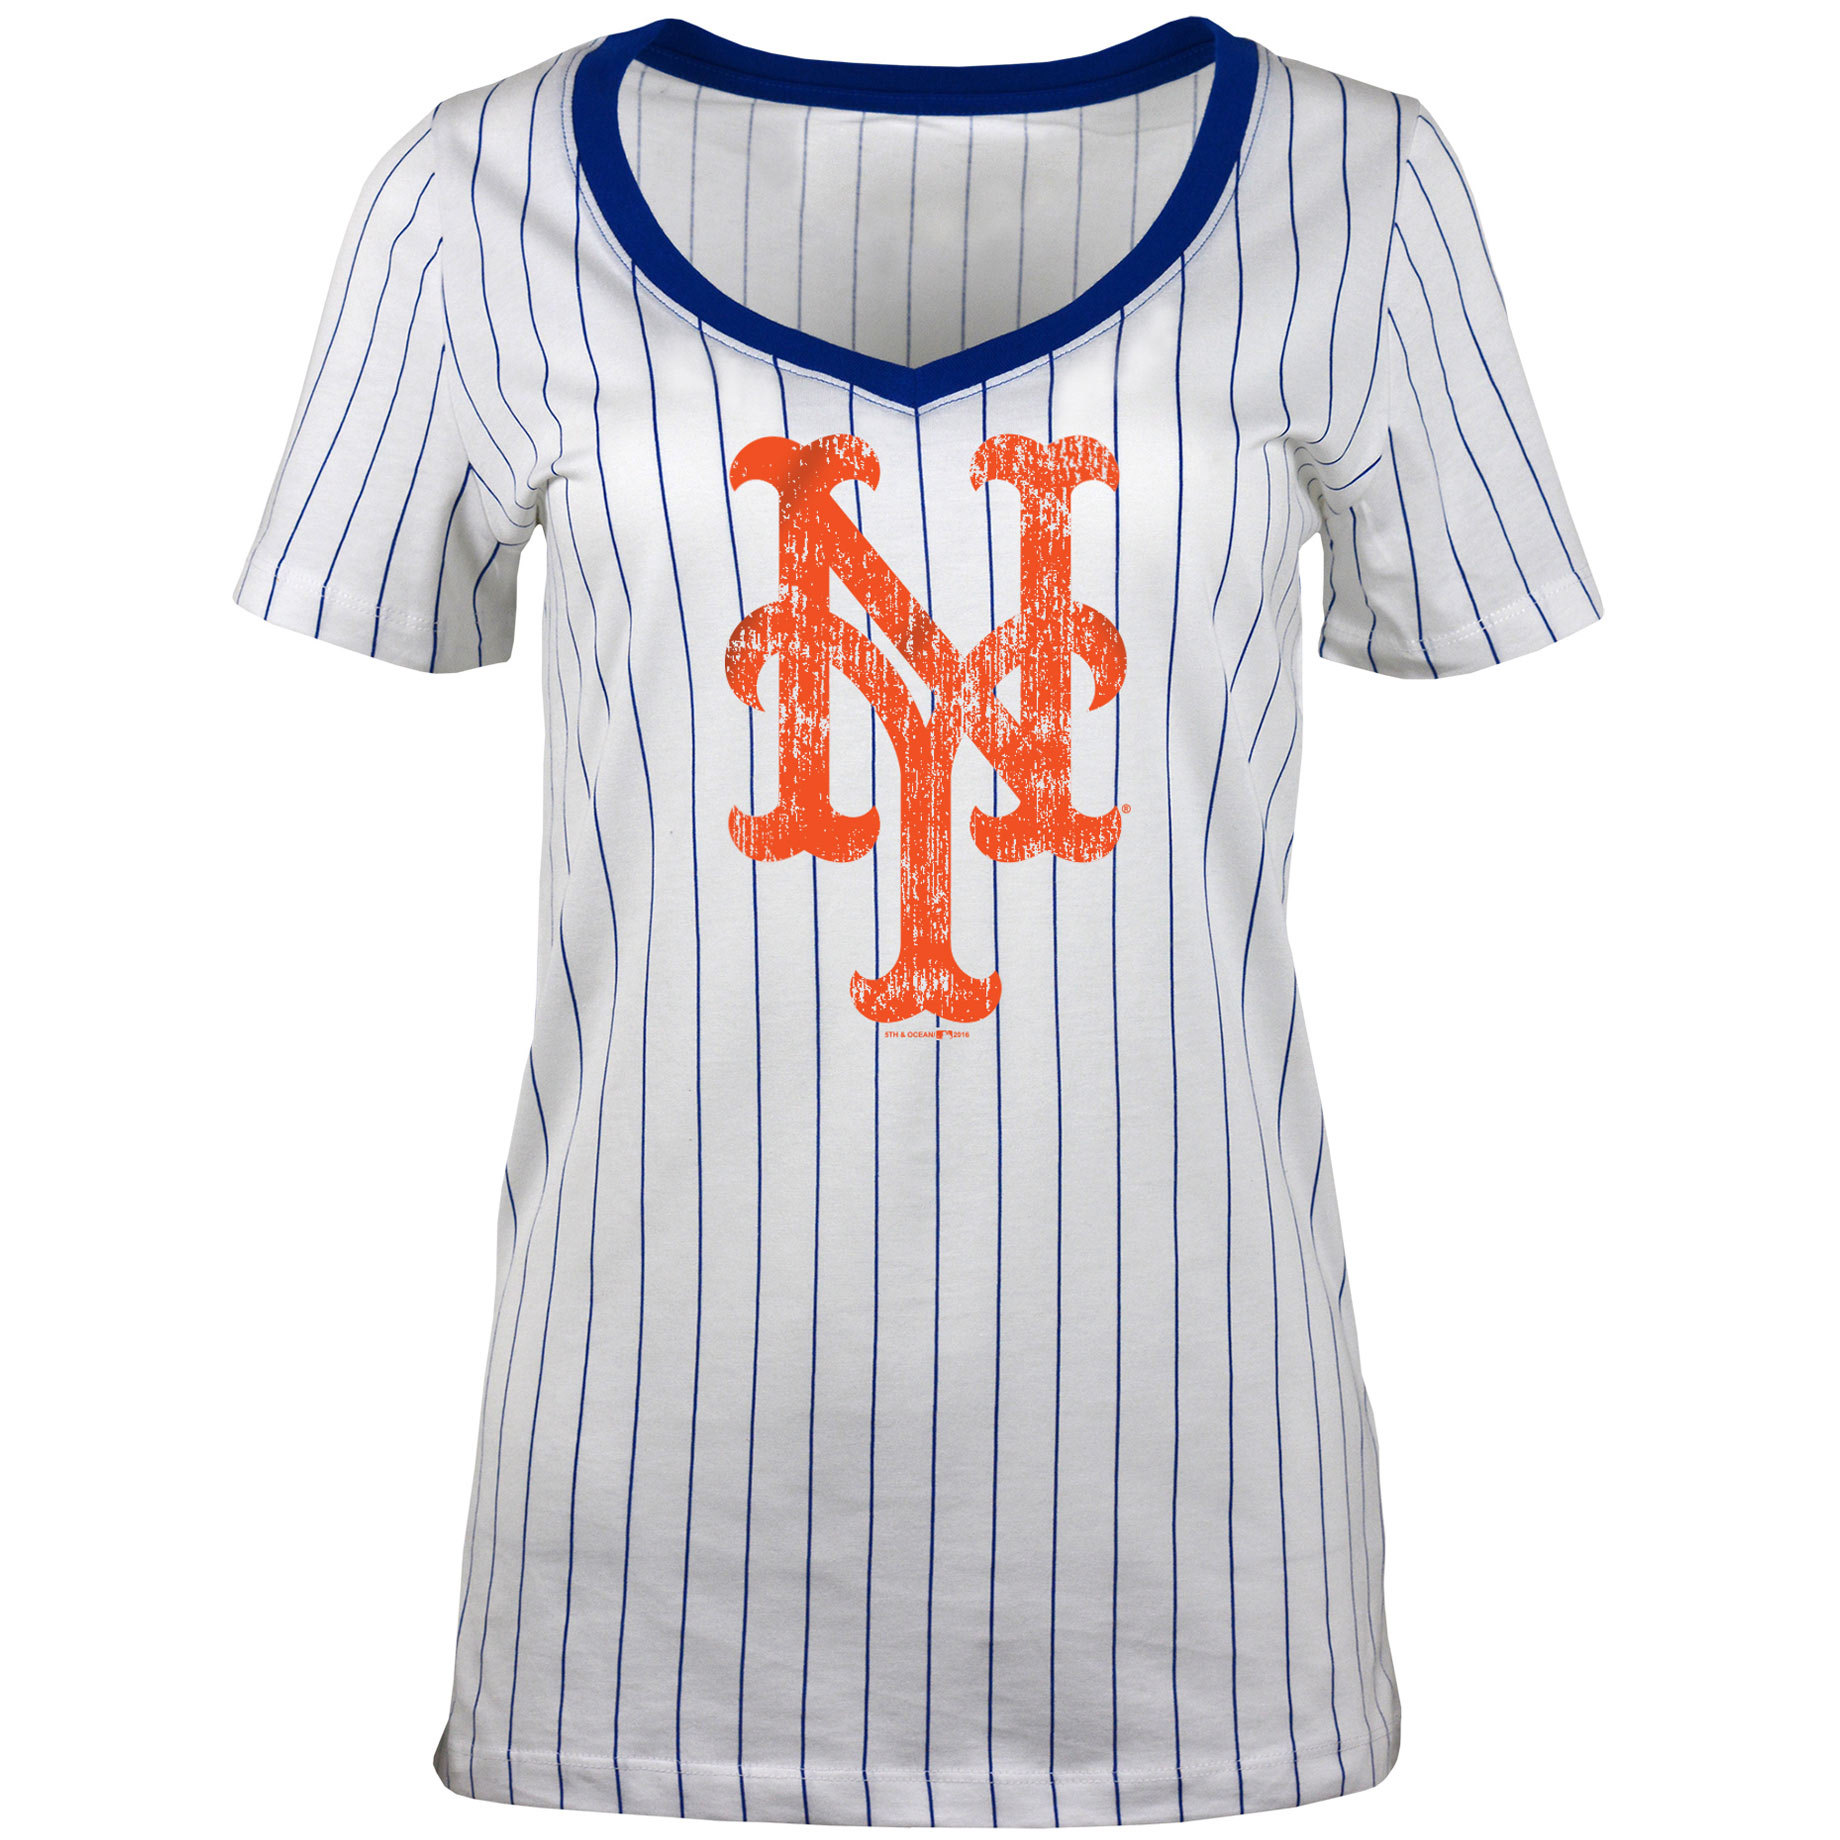 Women's 5th & Ocean by New Era White New York Mets Baby Jersey Pinstripe Ringer T-Shirt